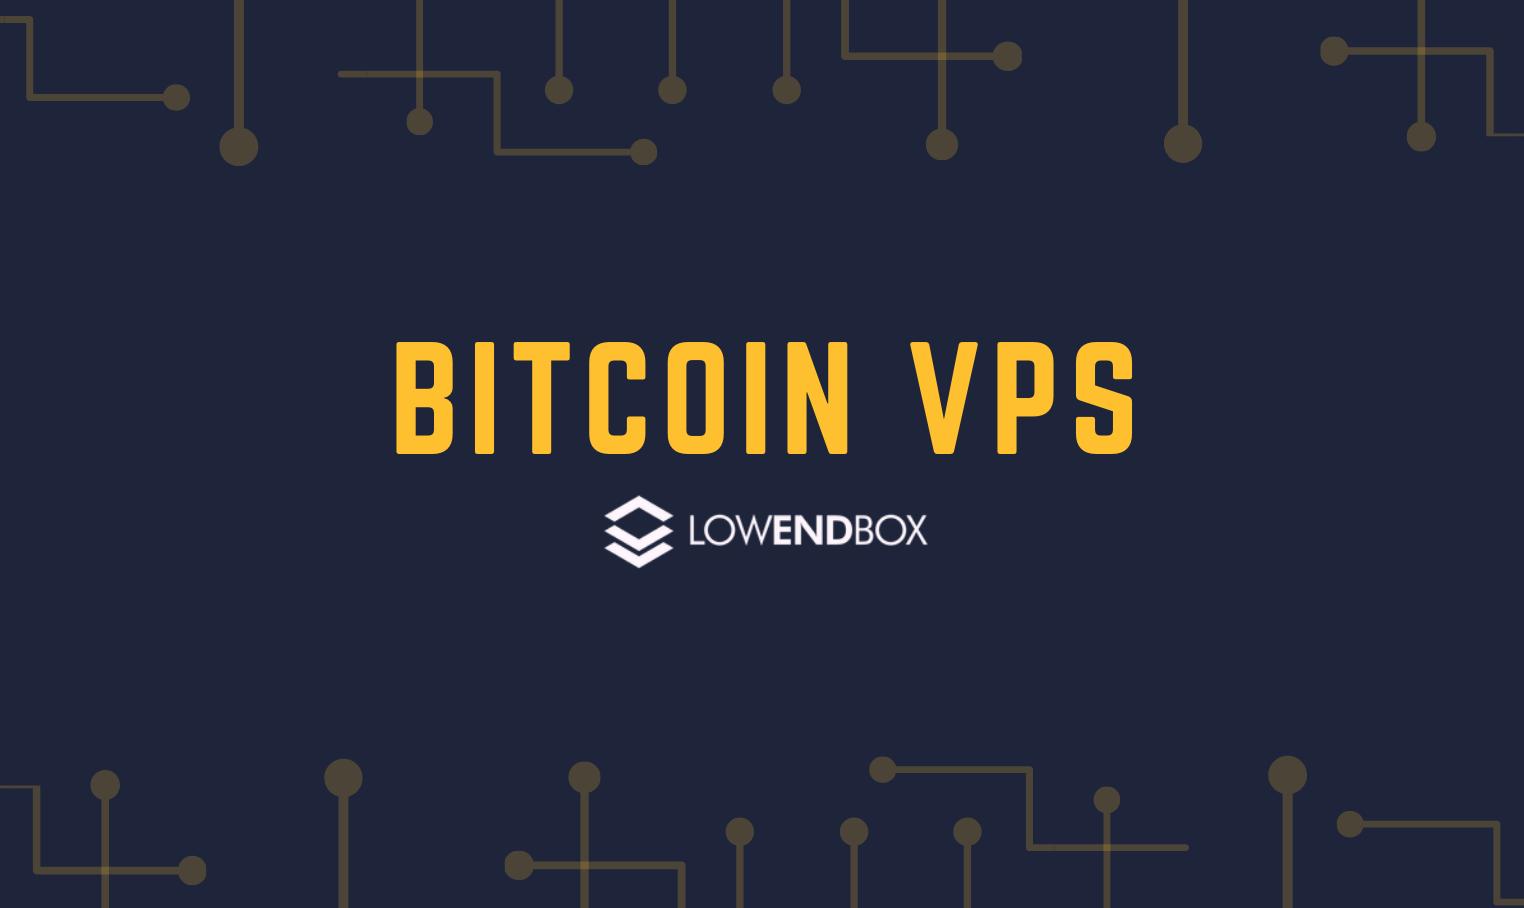 bitcoin vps)